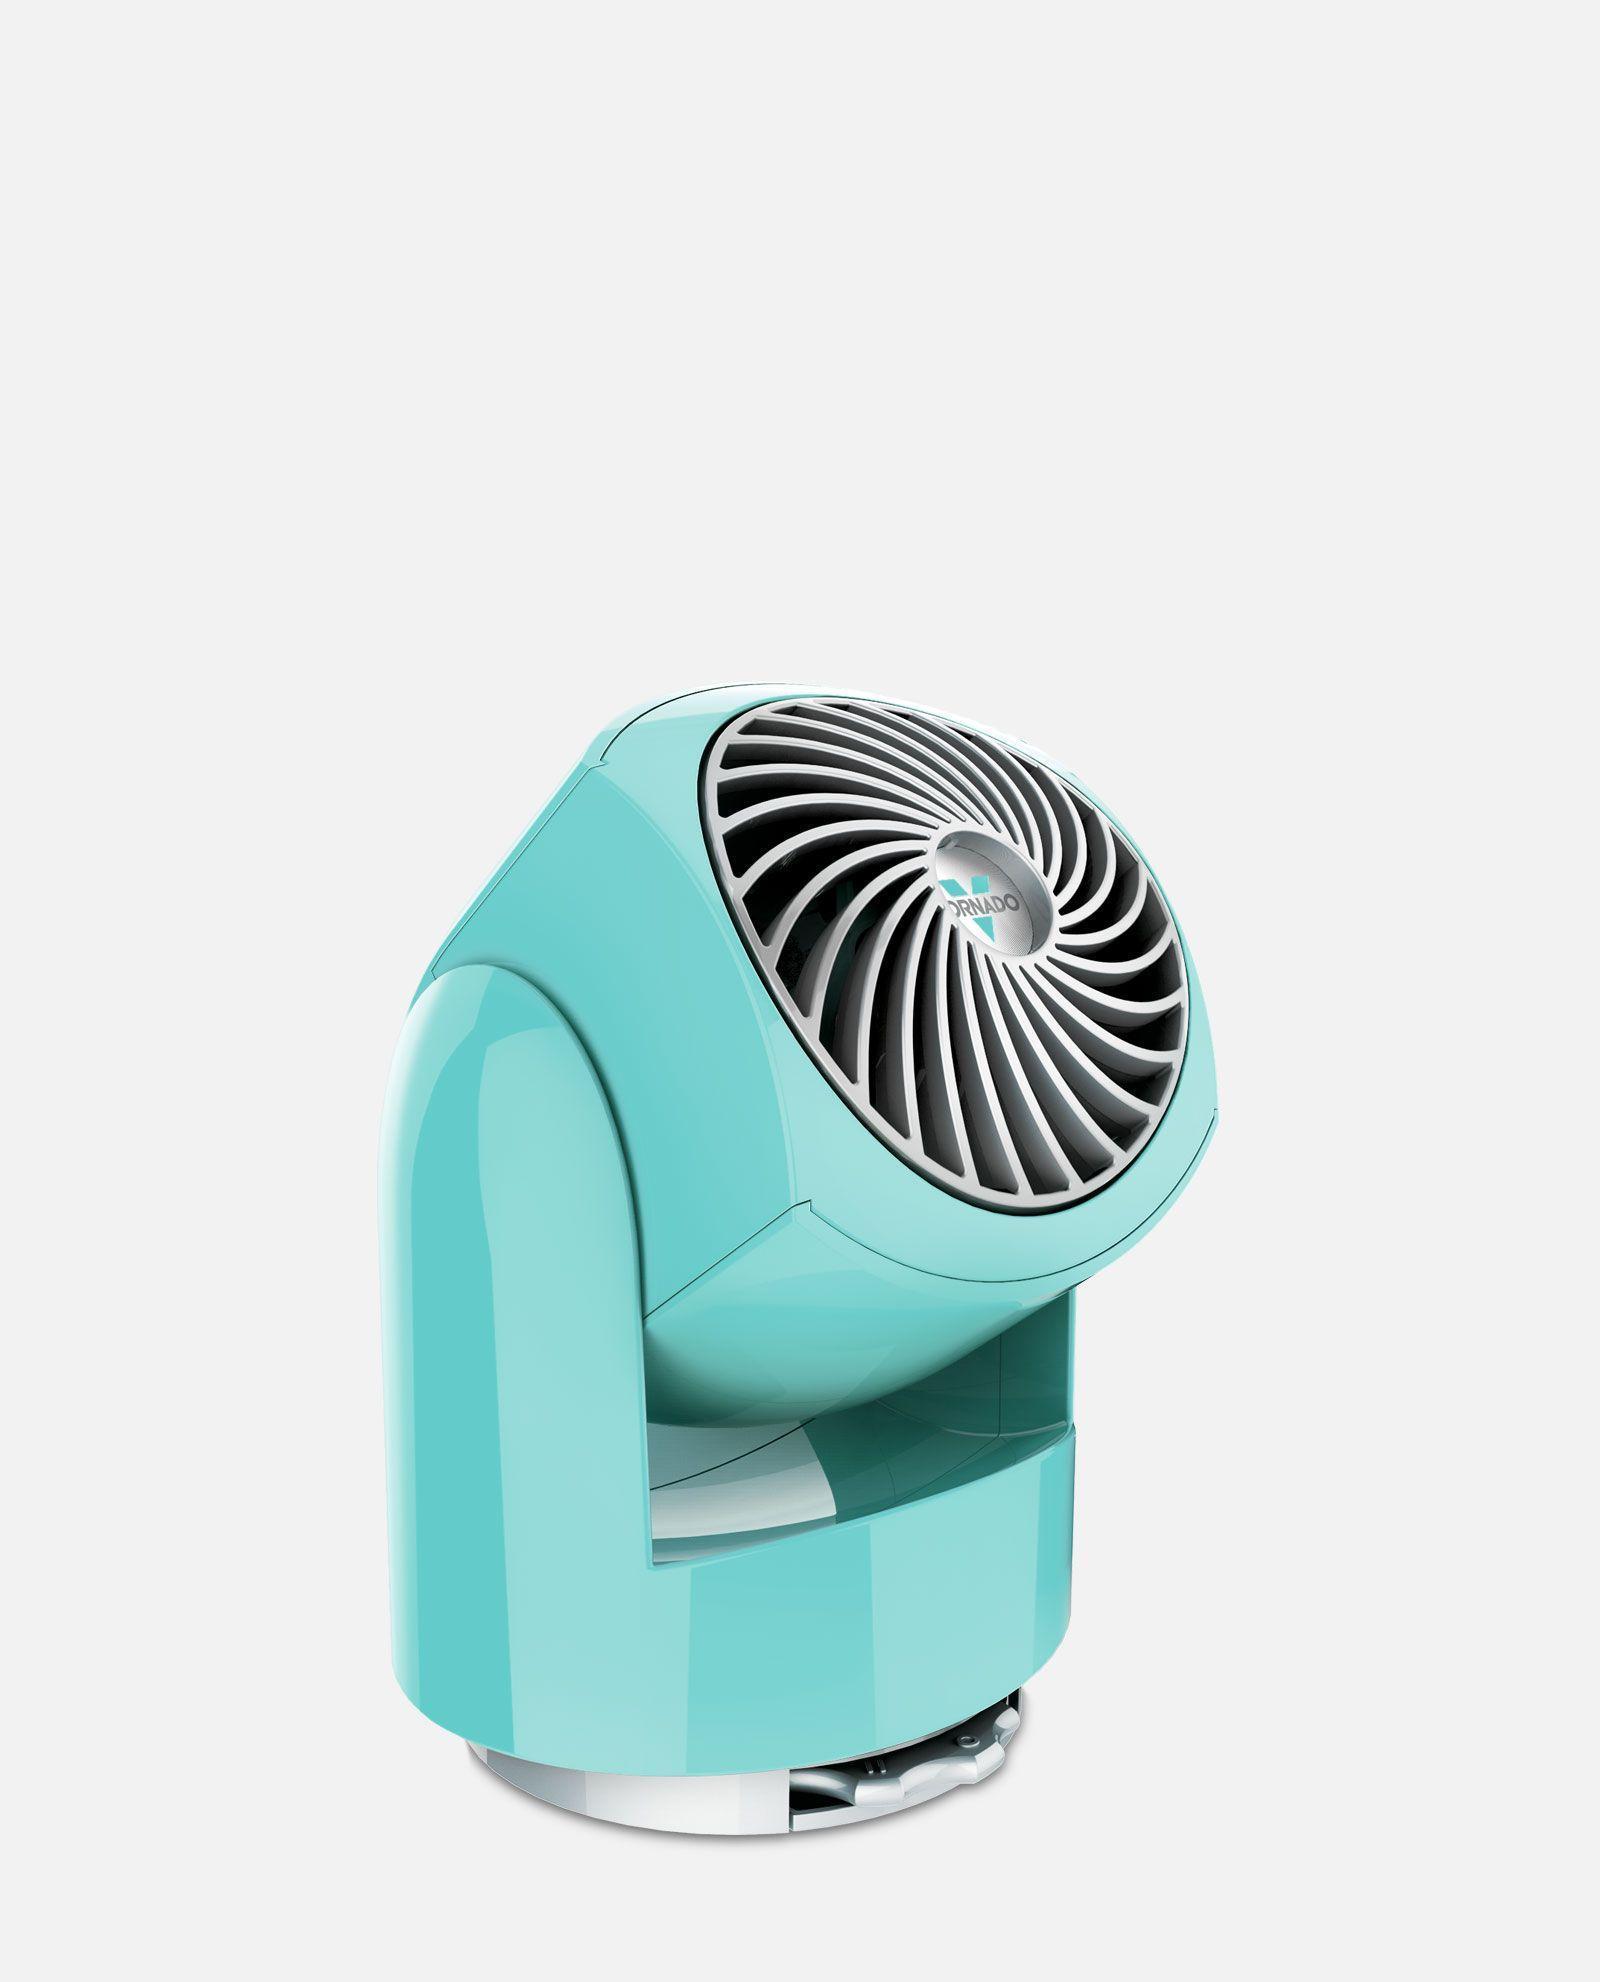 Flippi V6 Personal Air Circulator Vornado